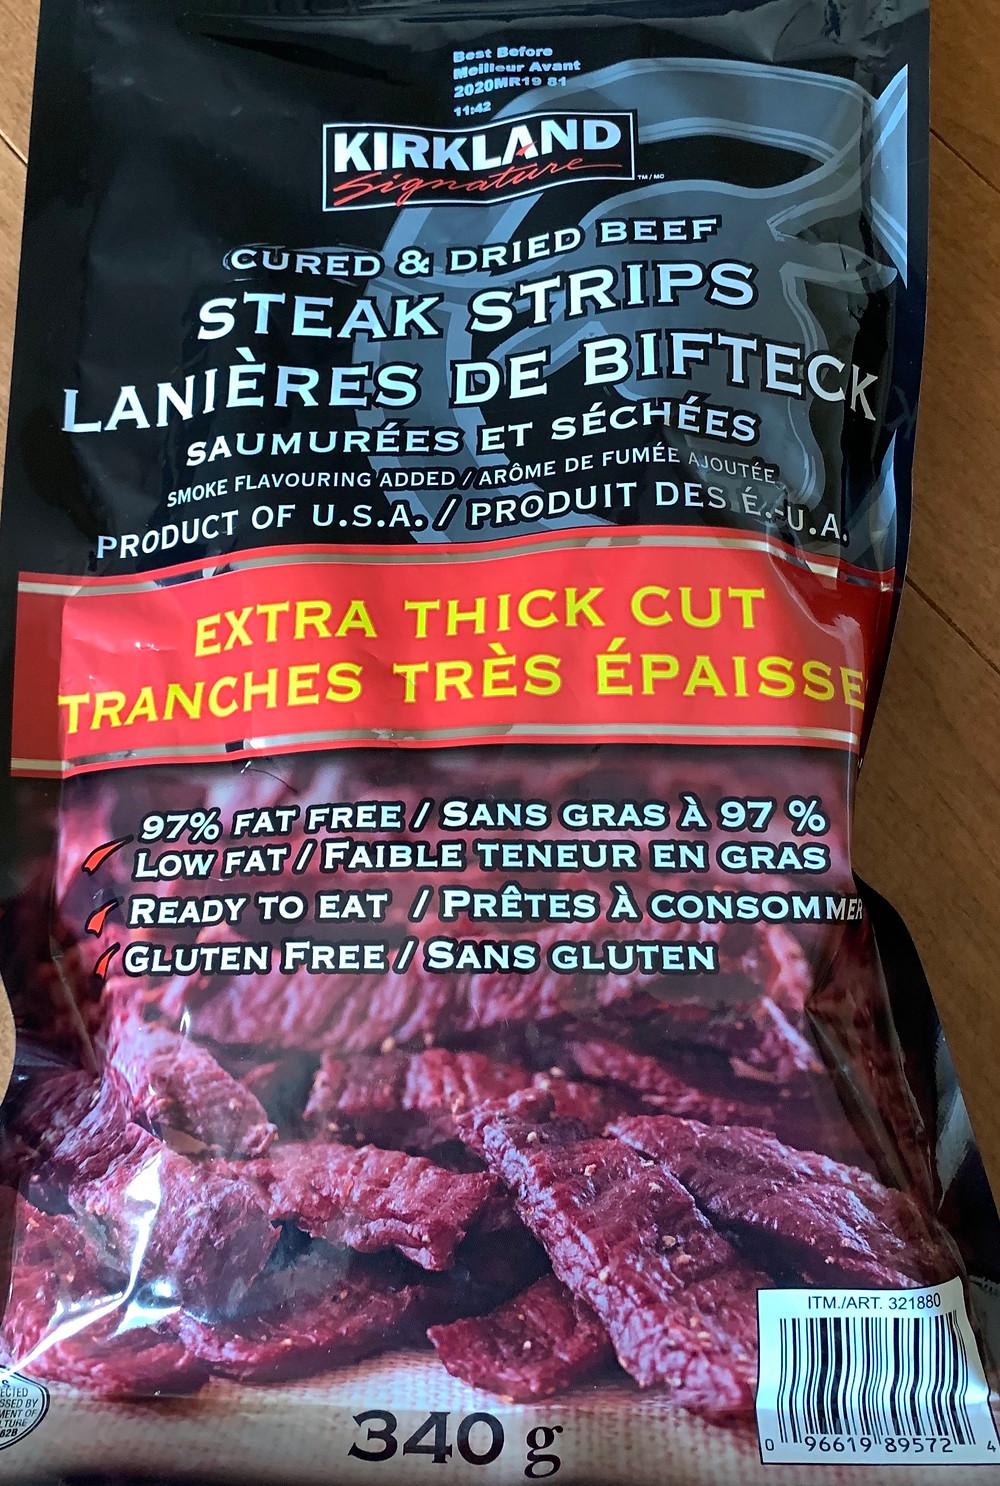 Costco Kirkland Signature Steak Strips